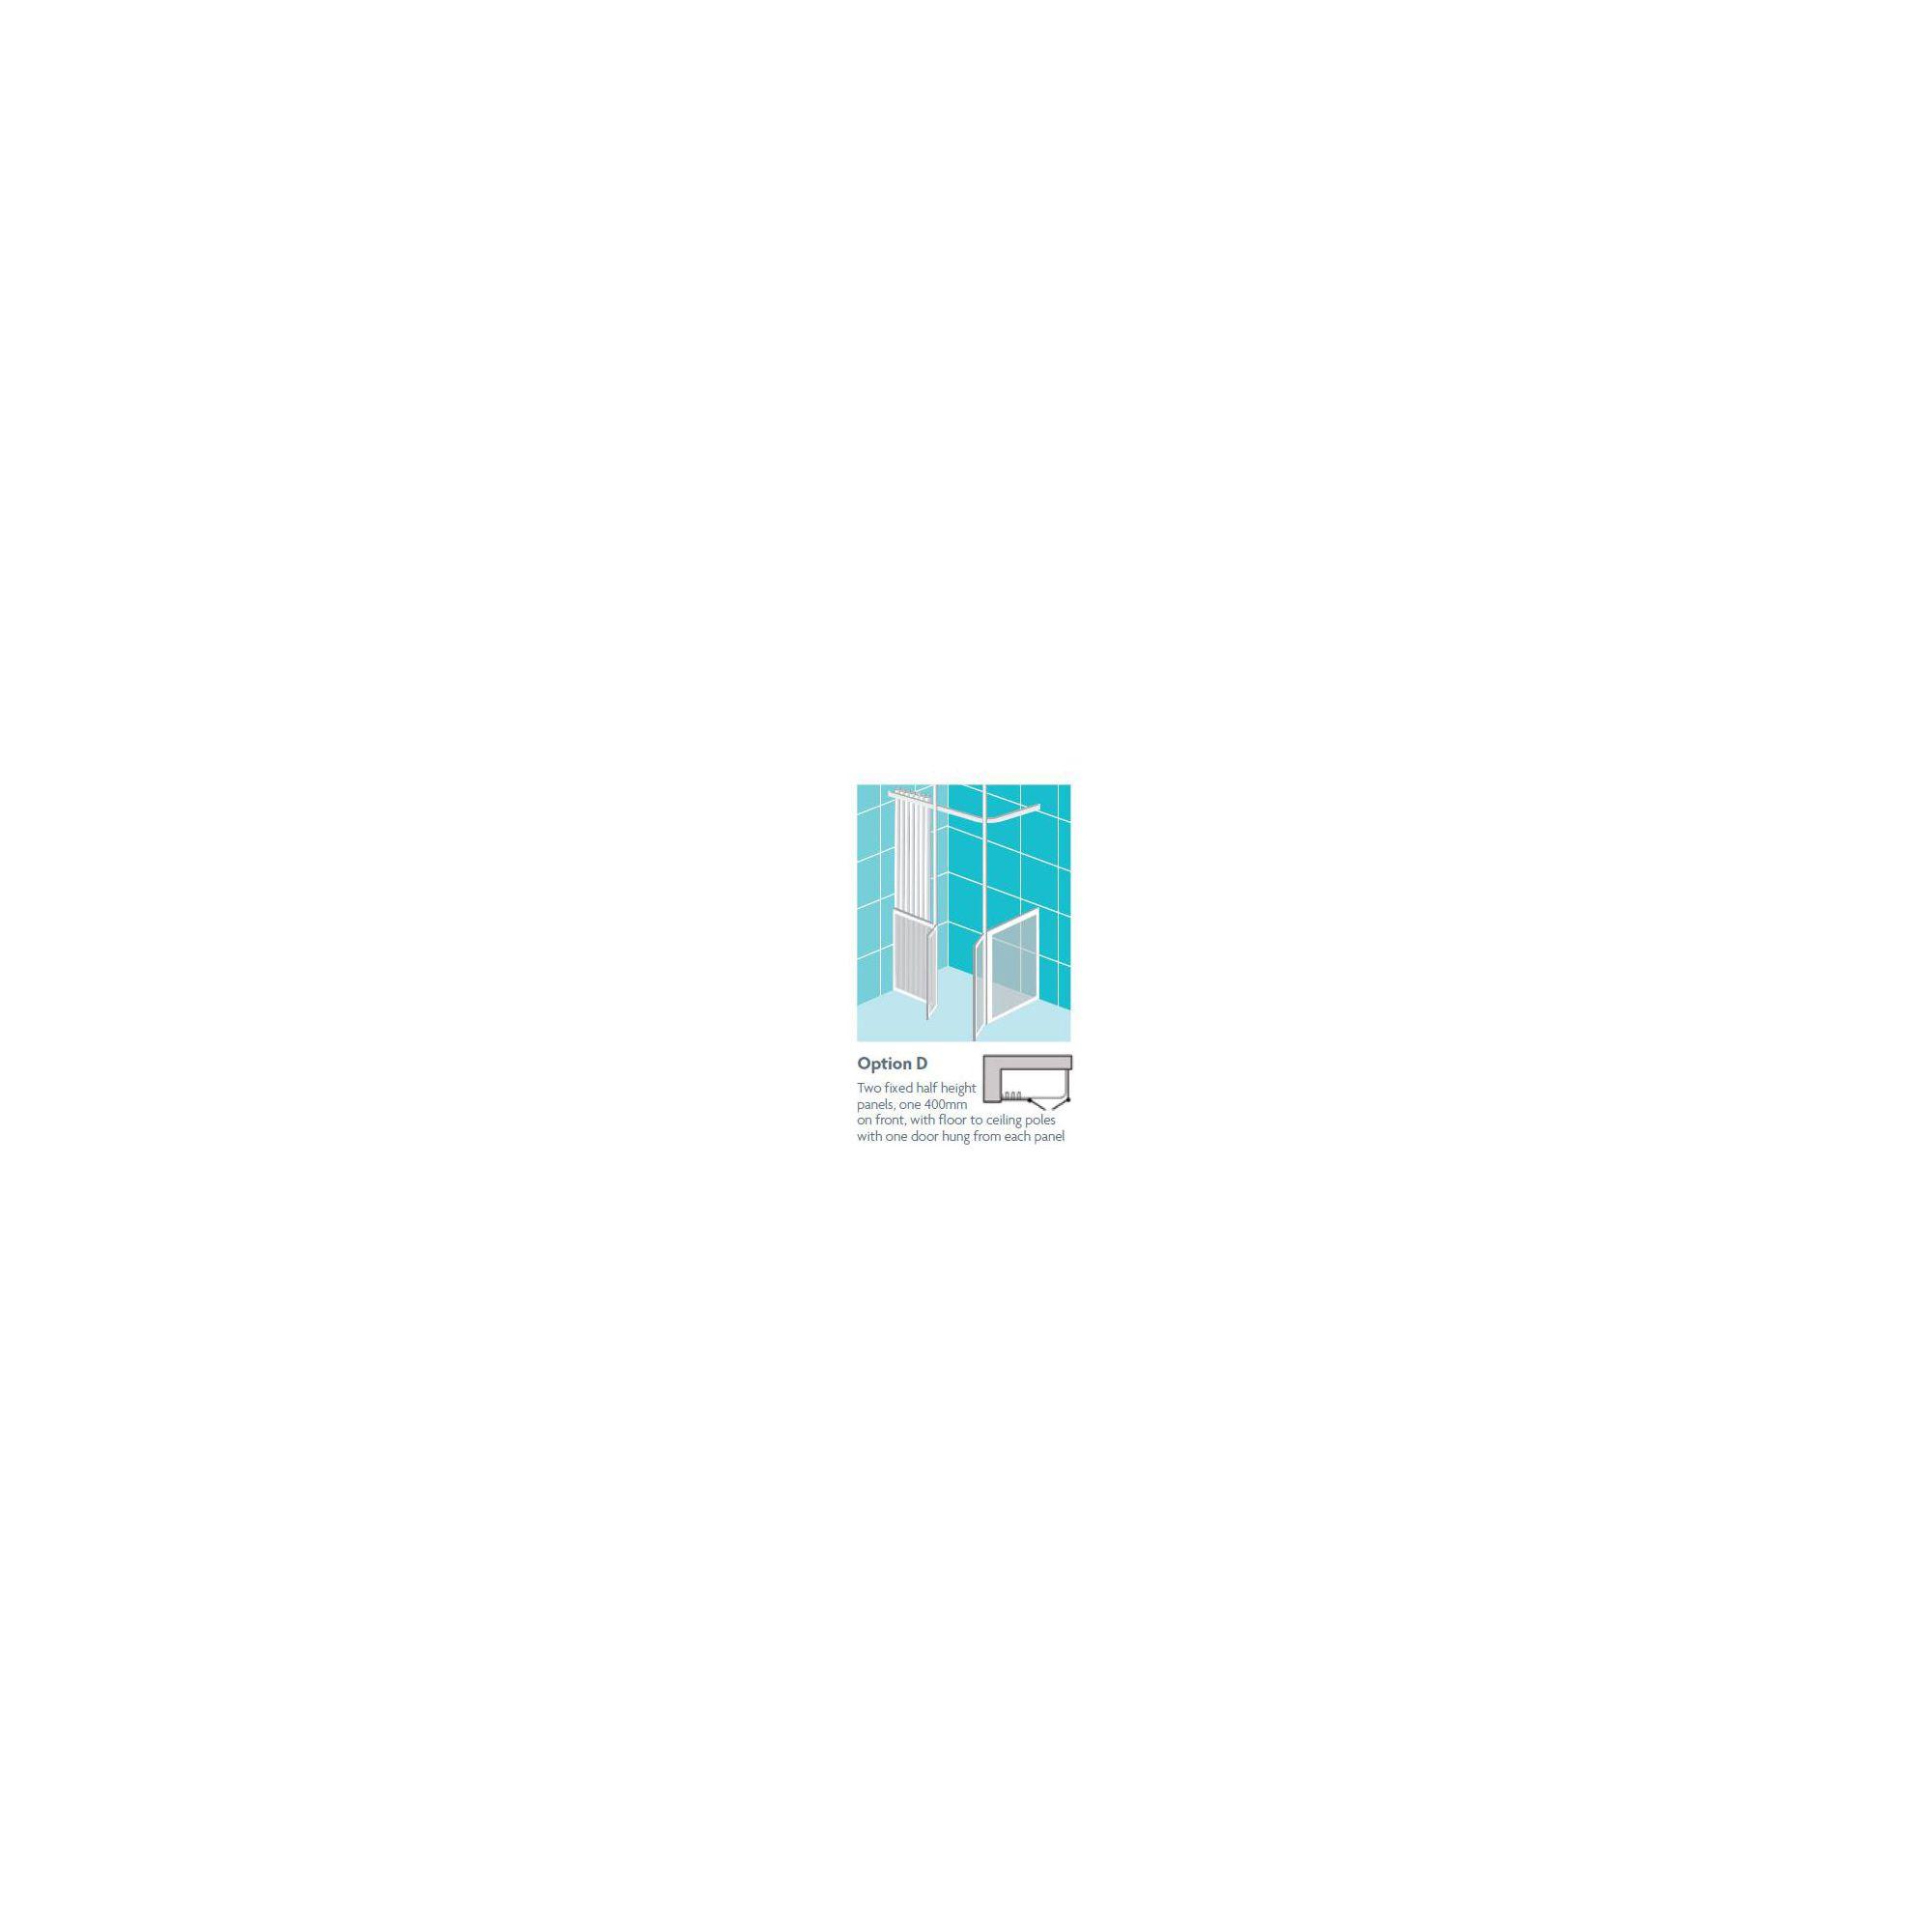 Impey Supreme Corner Door Option D Left Hand 1500mm x 830mm at Tescos Direct